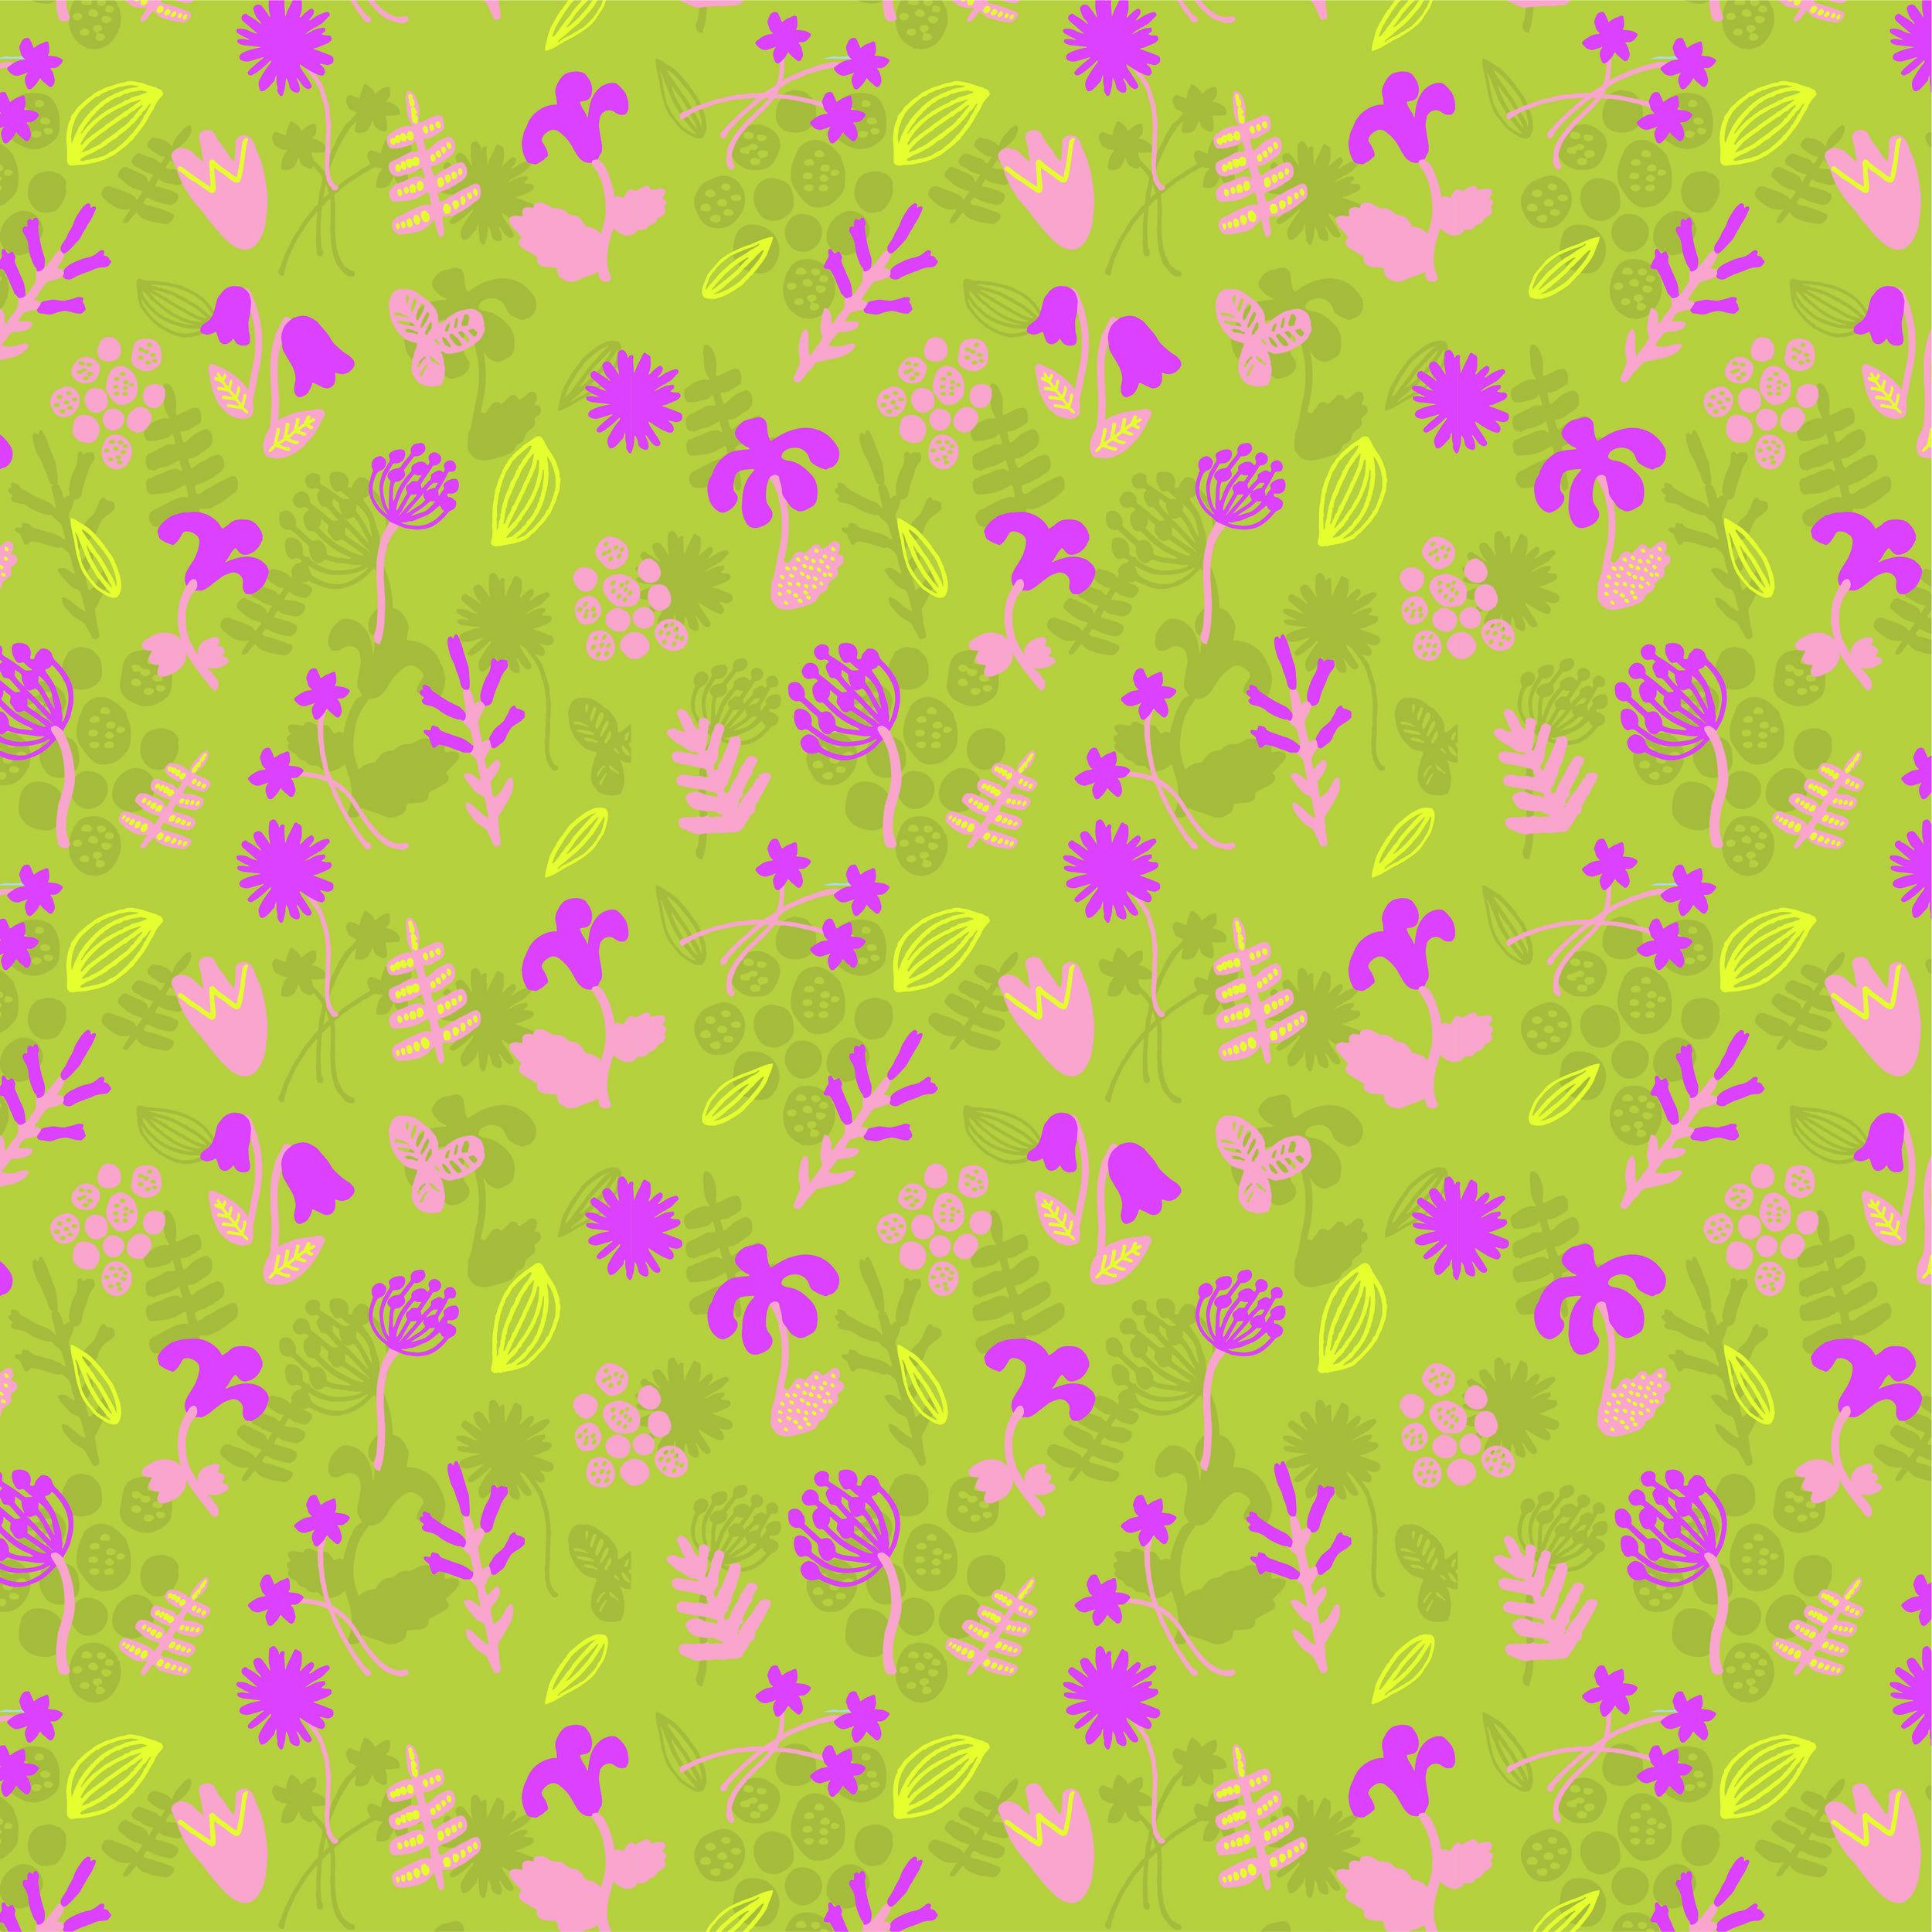 Blommönster-21.jpg